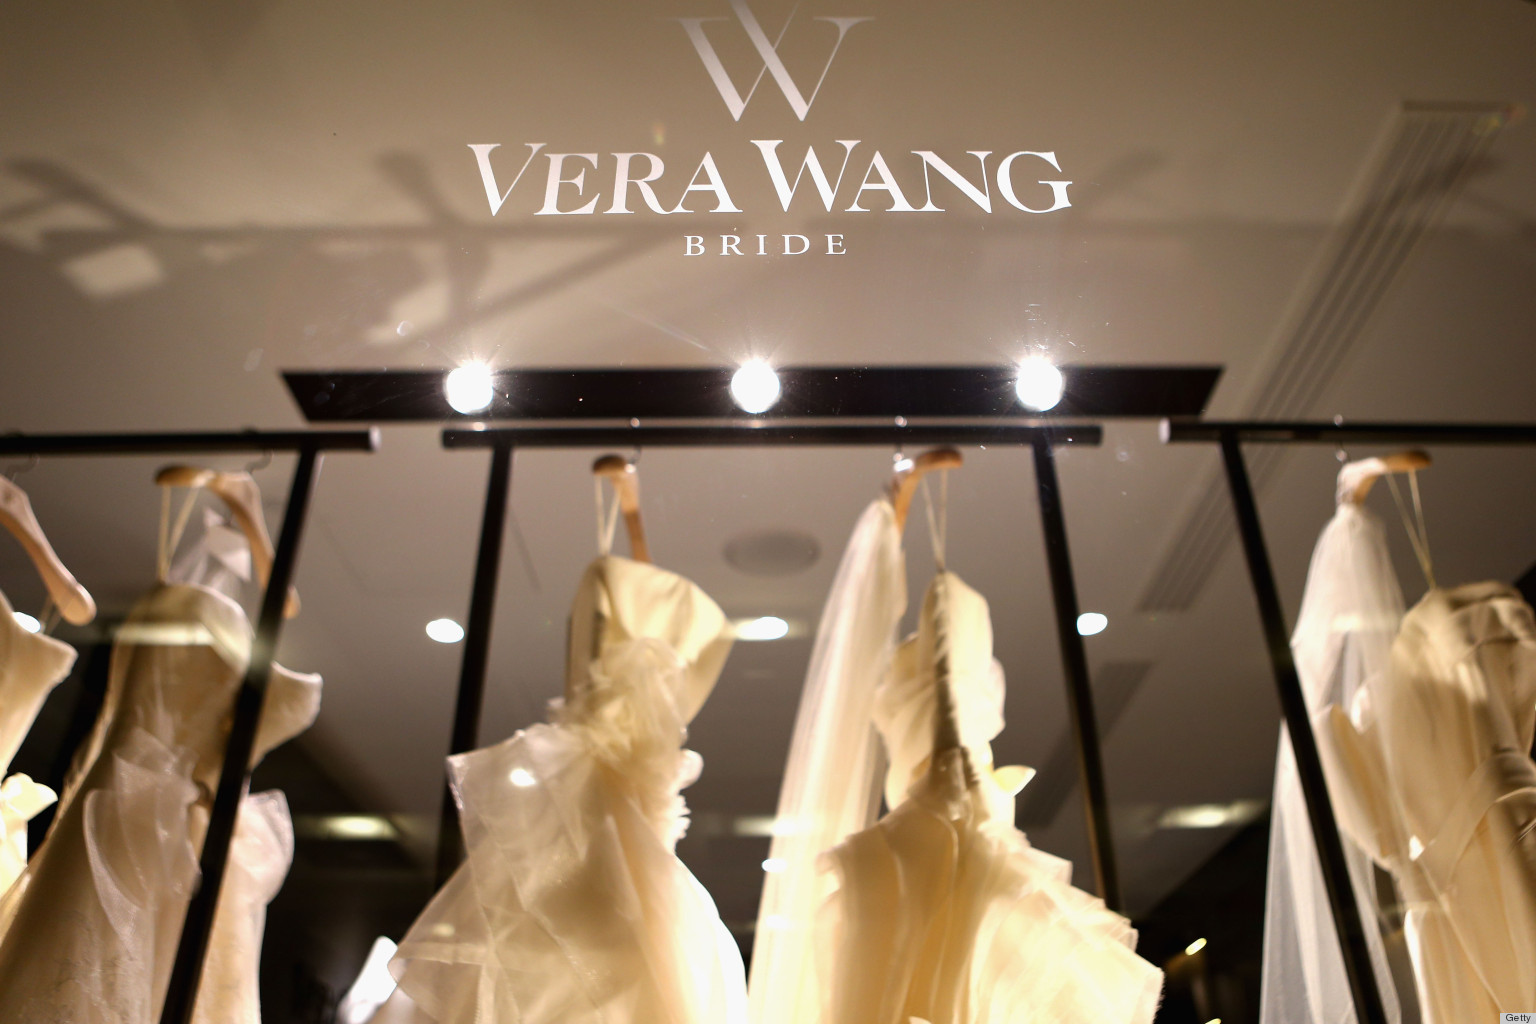 Latest Vera Wang Bridal House Ltd New York Ny U Wedding Photo Blog With Dress Store In